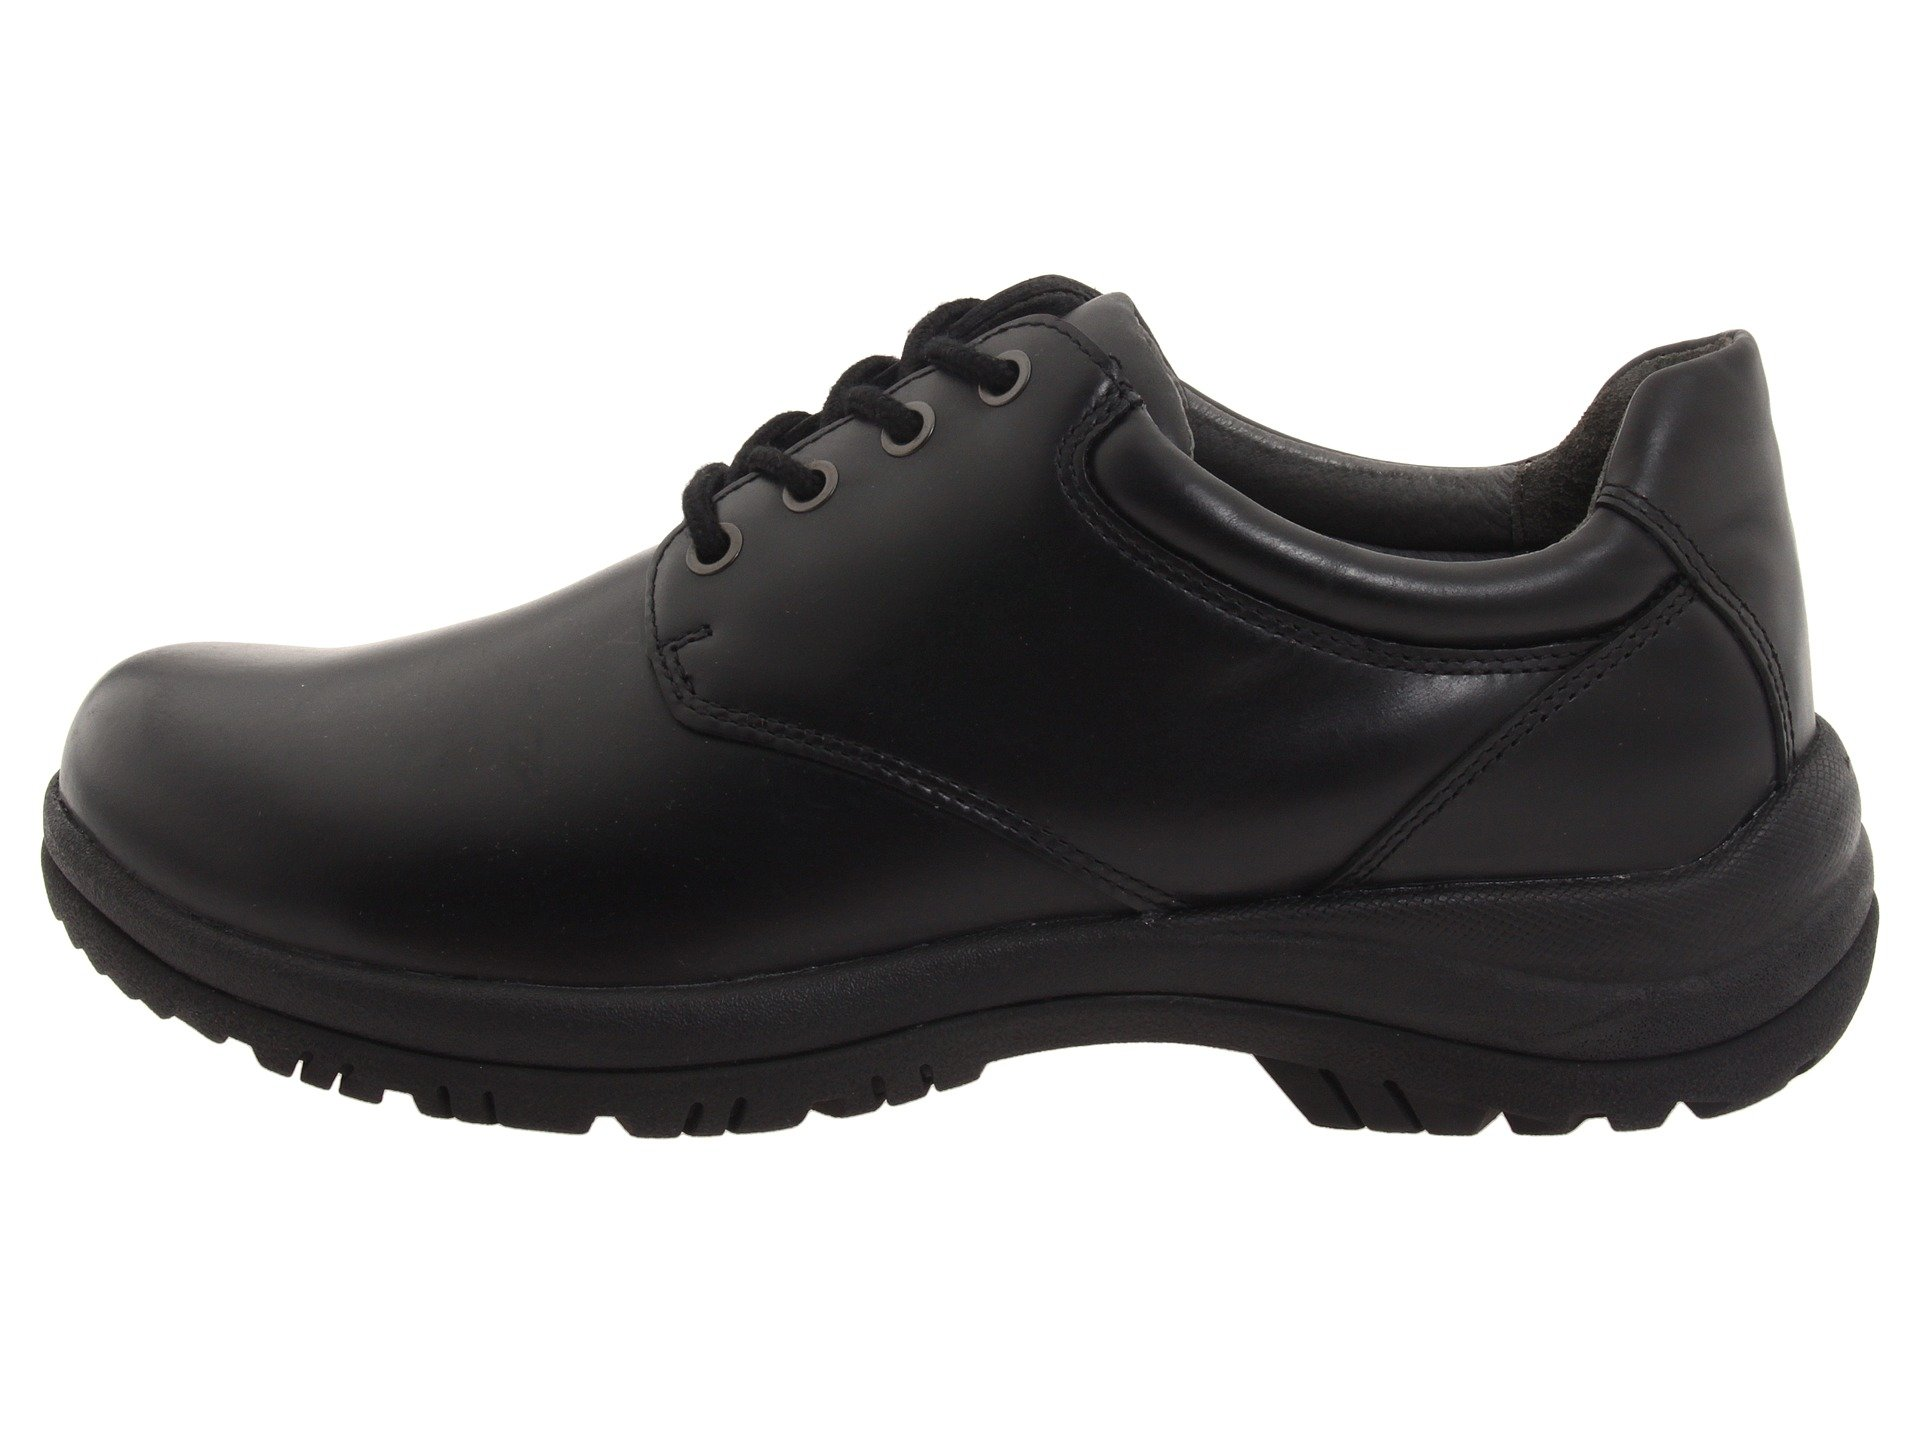 Smooth Dansko Black Walker Dansko Smooth Black Walker Leather x7qSw